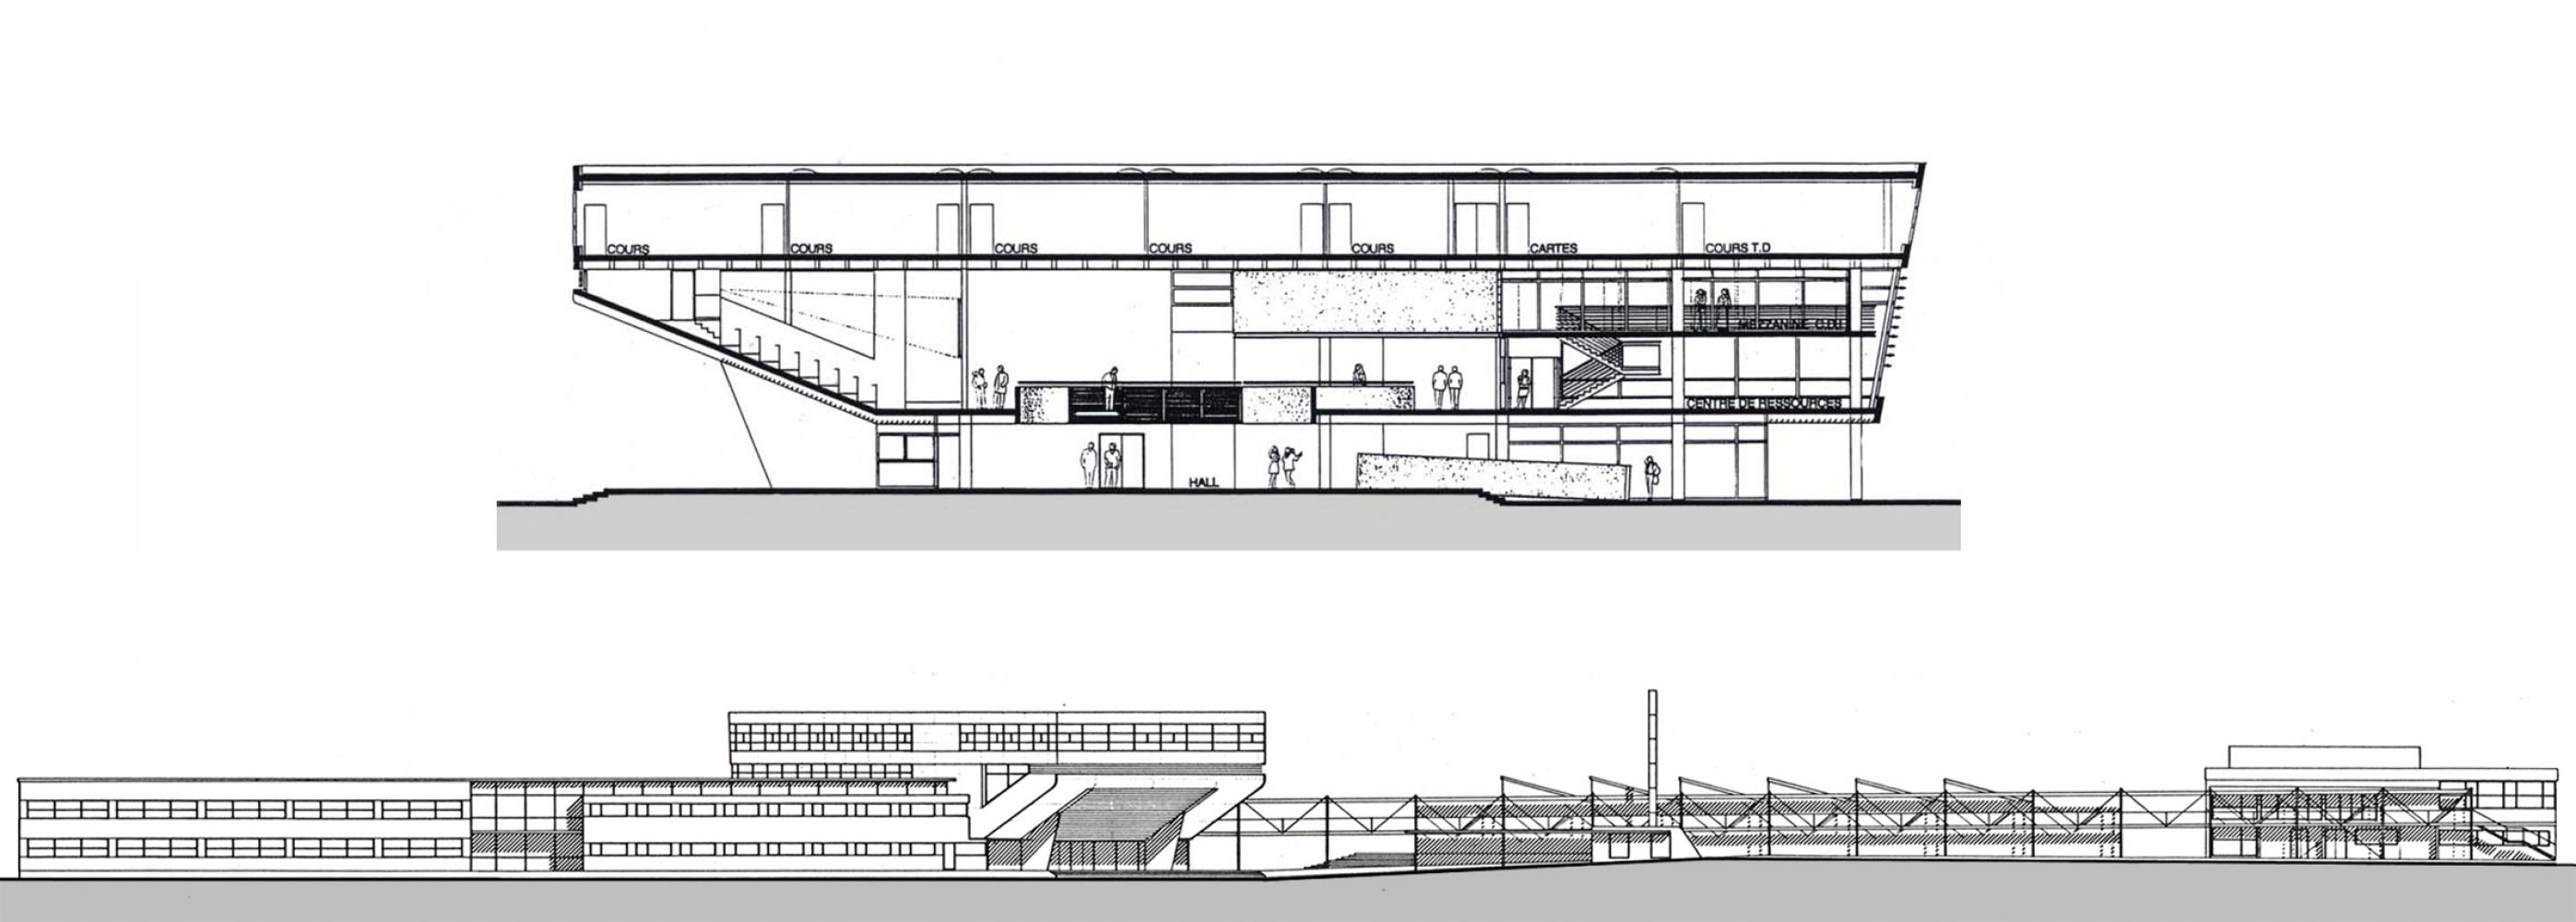 xlong--08 Pascale SEURIN Architecte - Pascale SEURIN Architecte